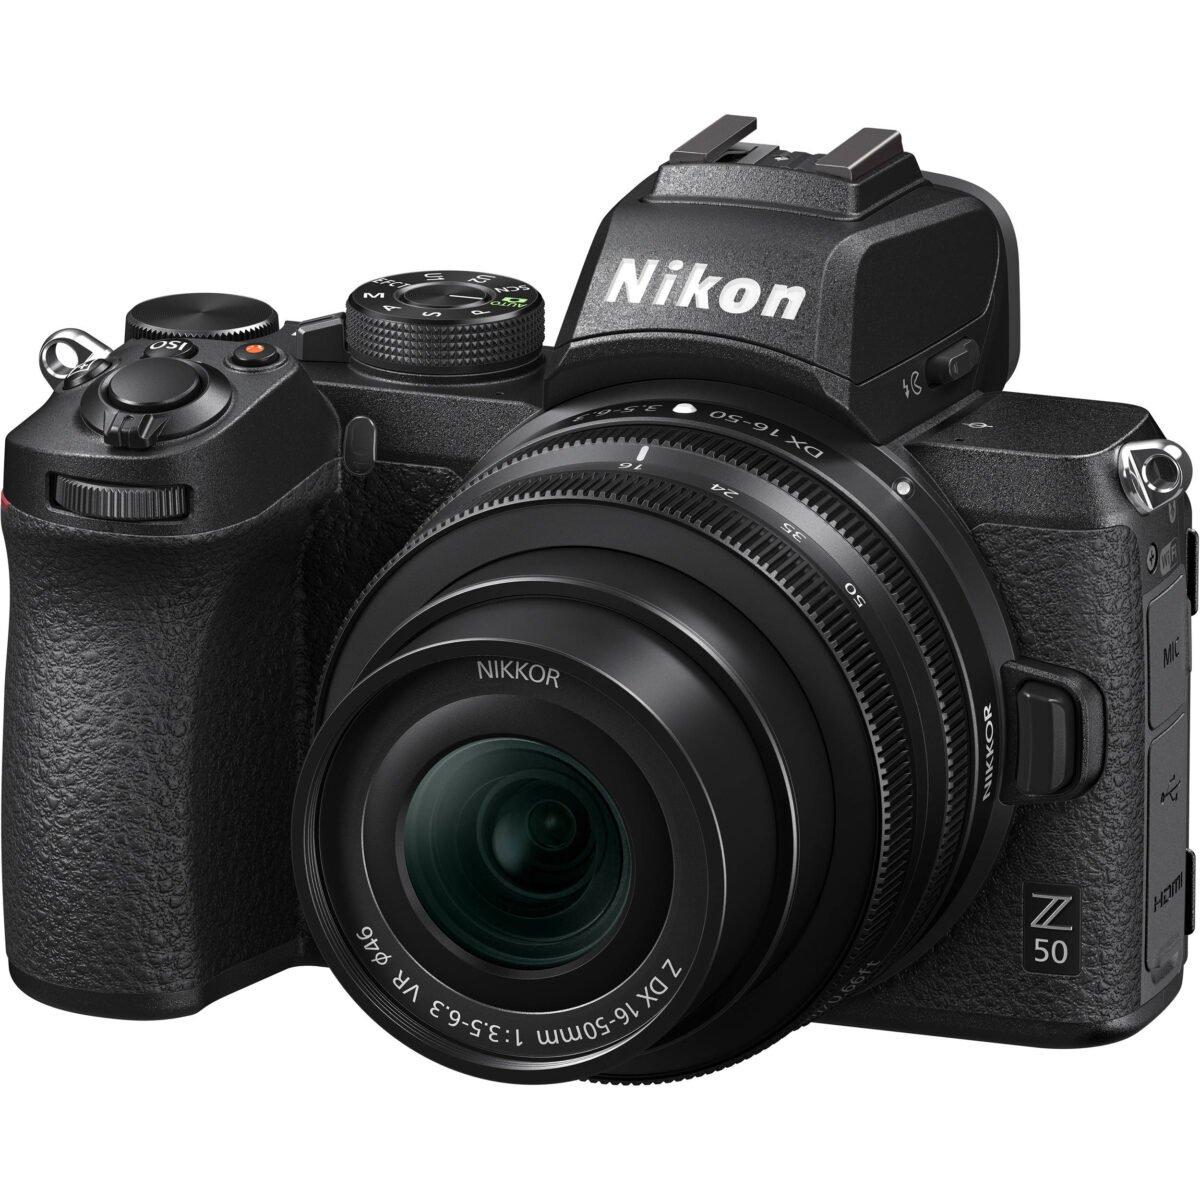 Nikon Z50 Mirrorless Digital Camera with 16-50mm f/3.5-6.3 VR Kit